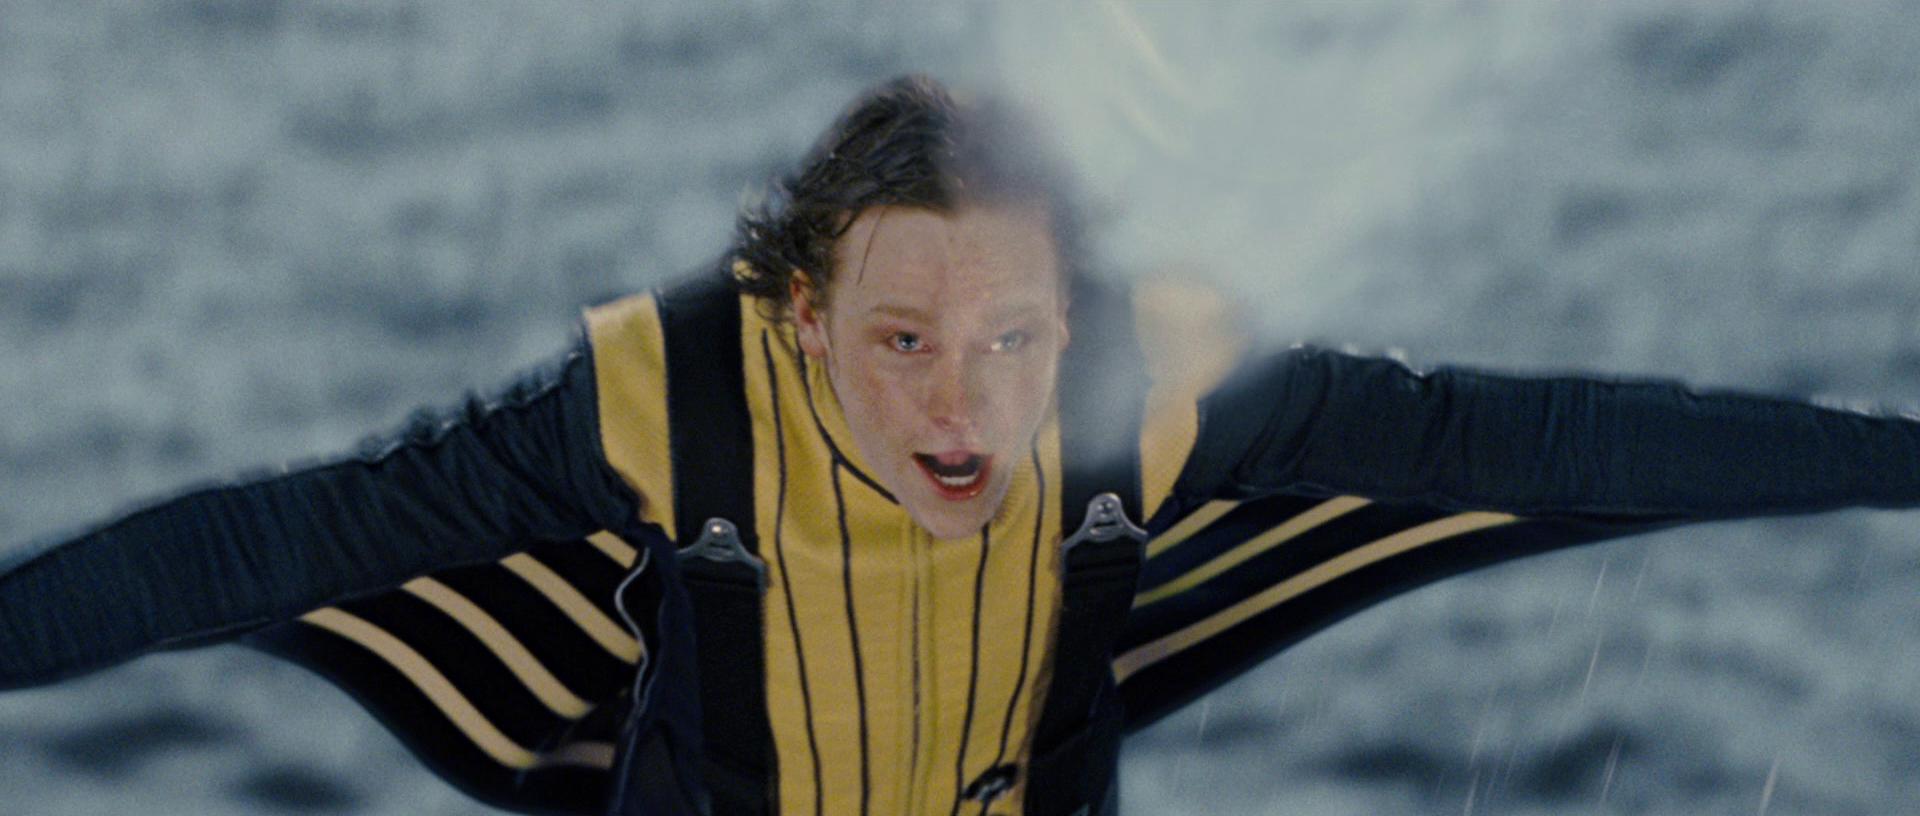 Image - BansheeScream-XMFC.png | X-Men Movies Wiki ...